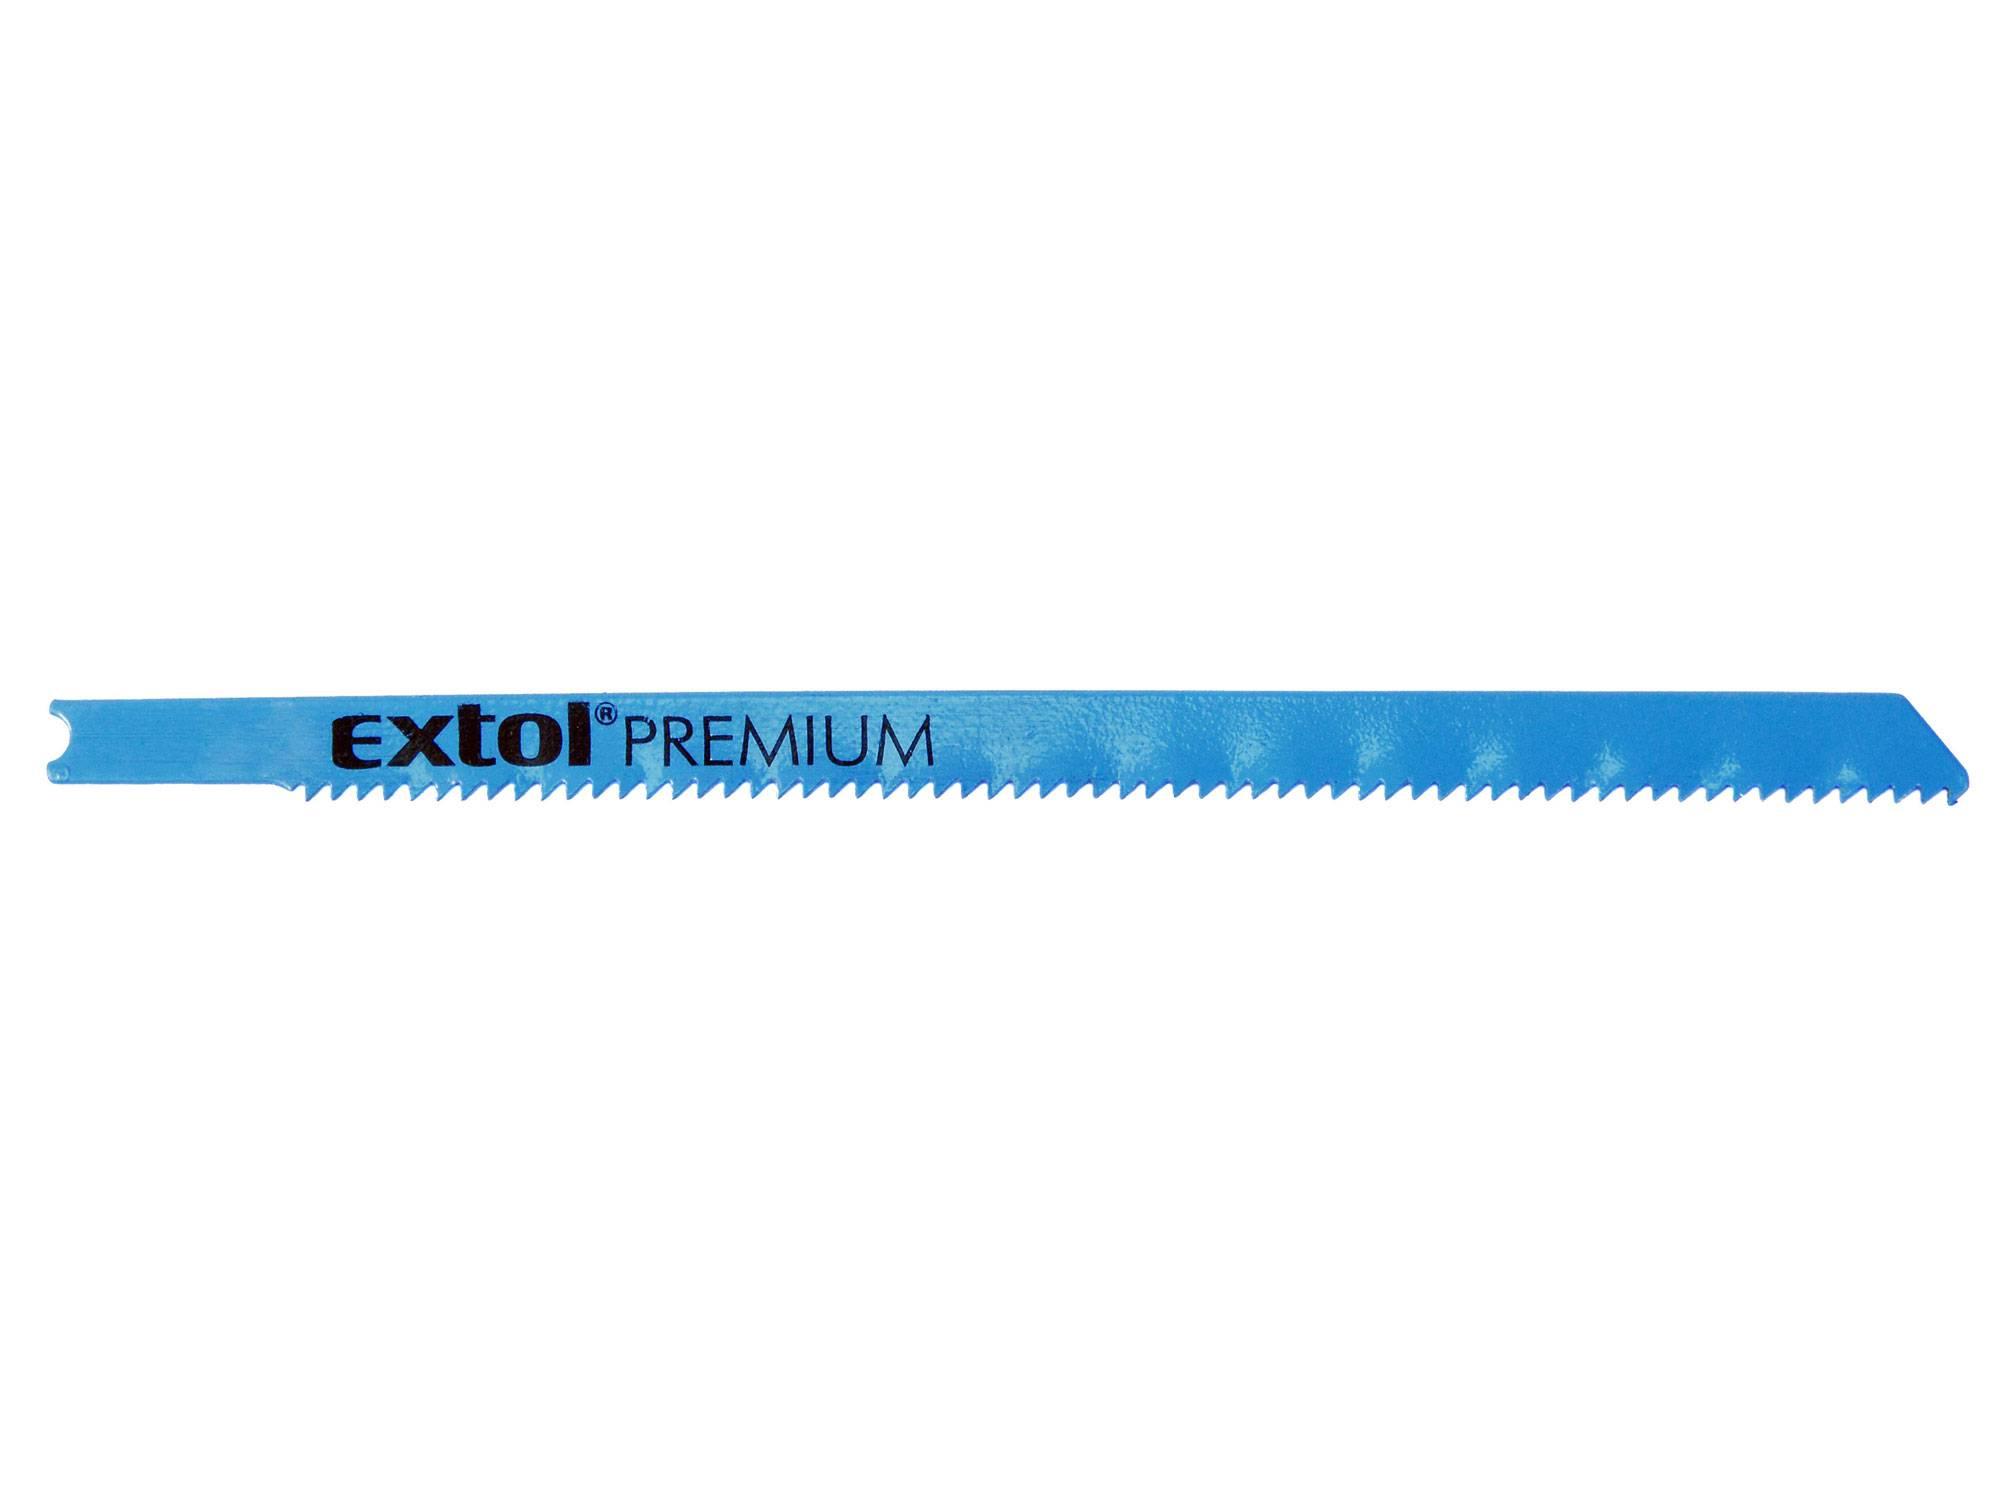 plátky do přímočaré pily 5ks, 106x1,8mm, Bi-metal 8805705 EXTOL PREMIUM